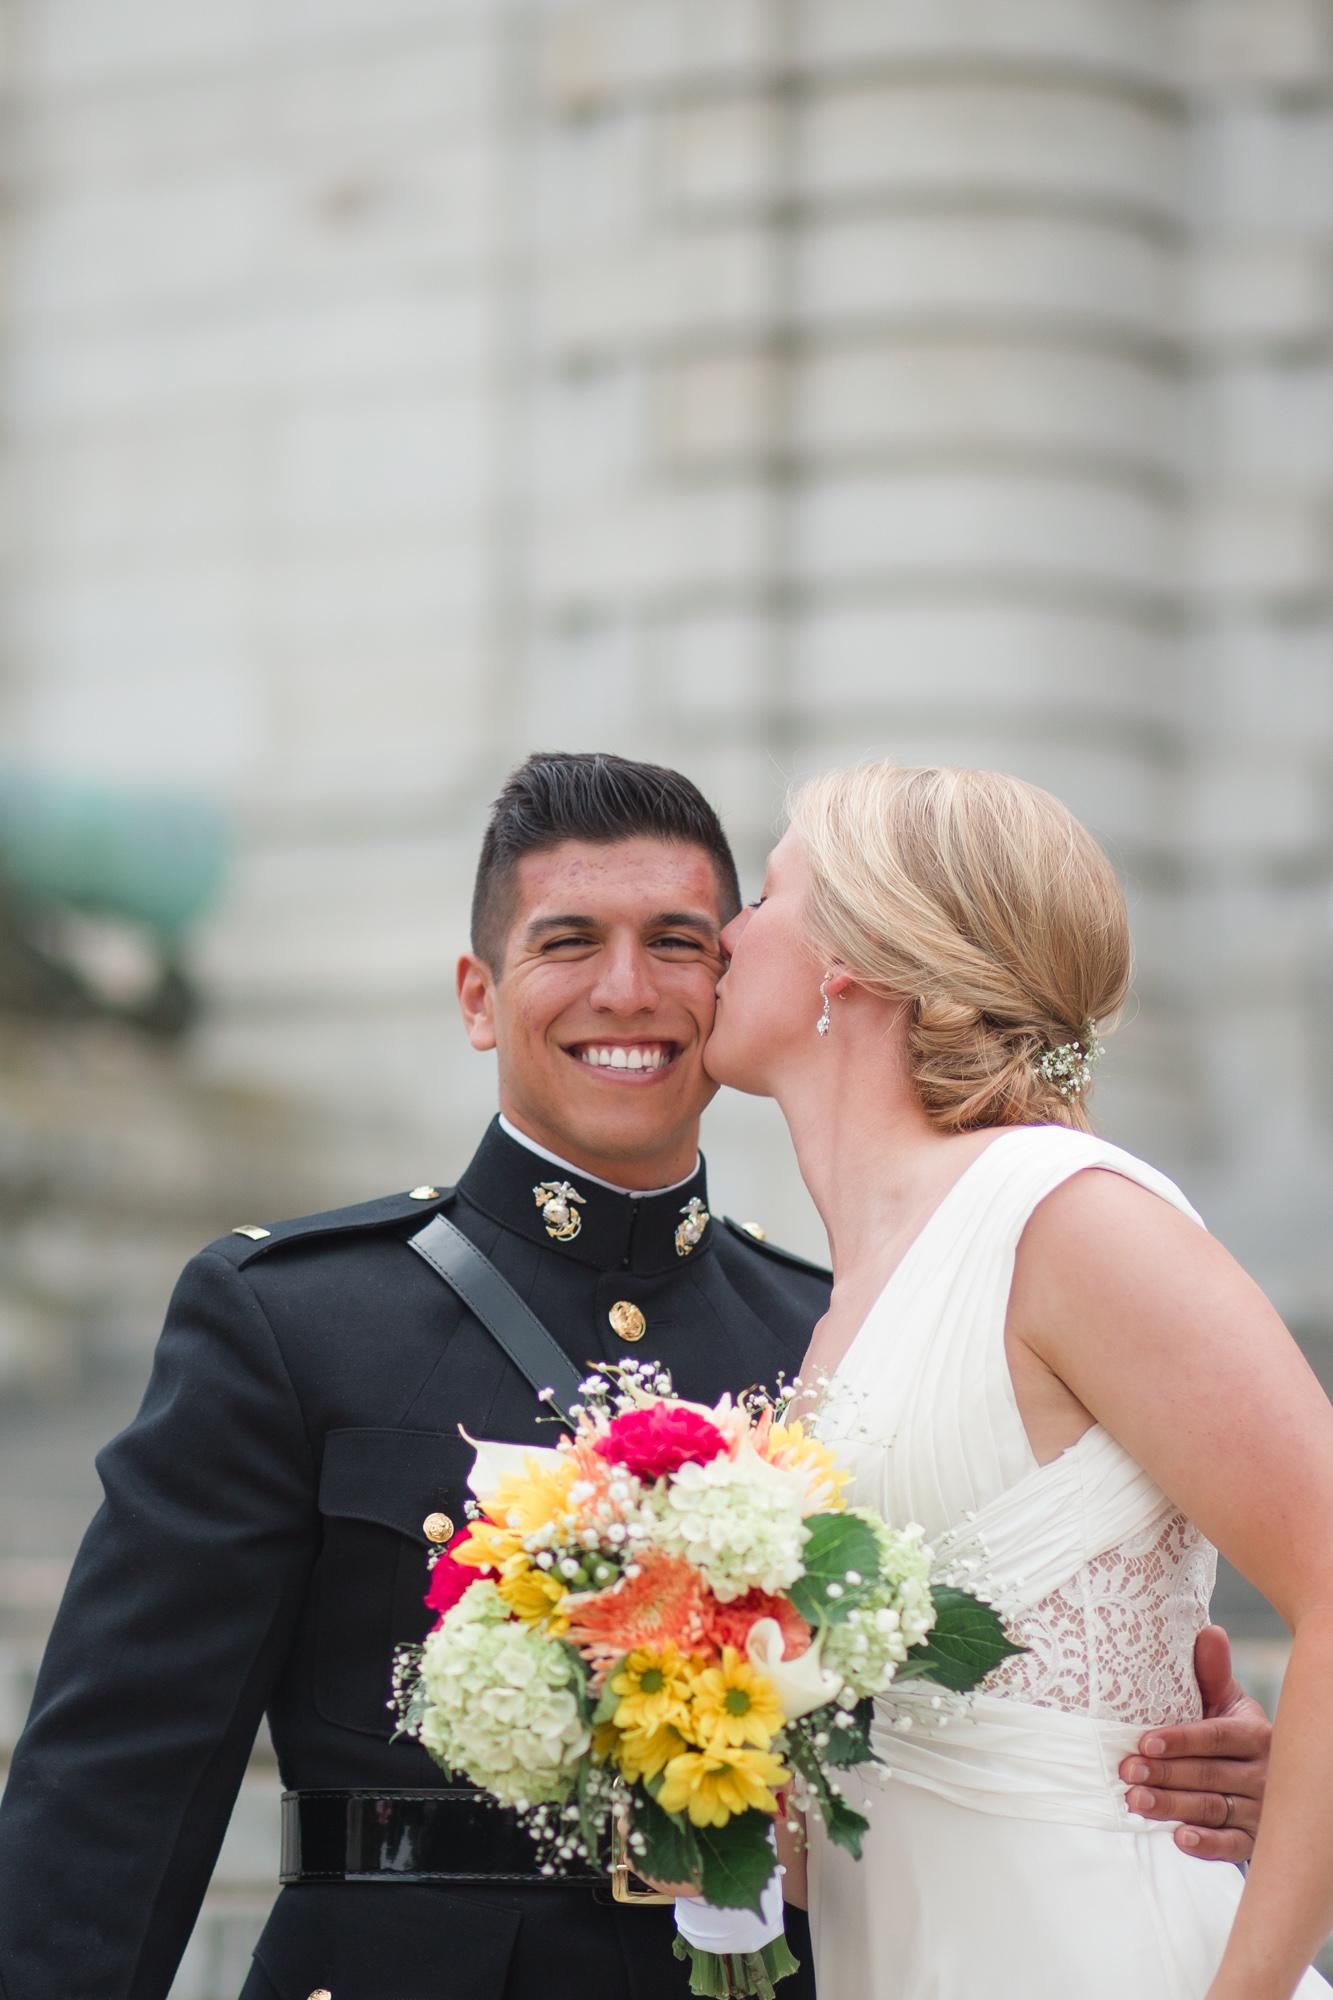 2017_05_27_ray_caroline_naval_wedding-3189.jpg